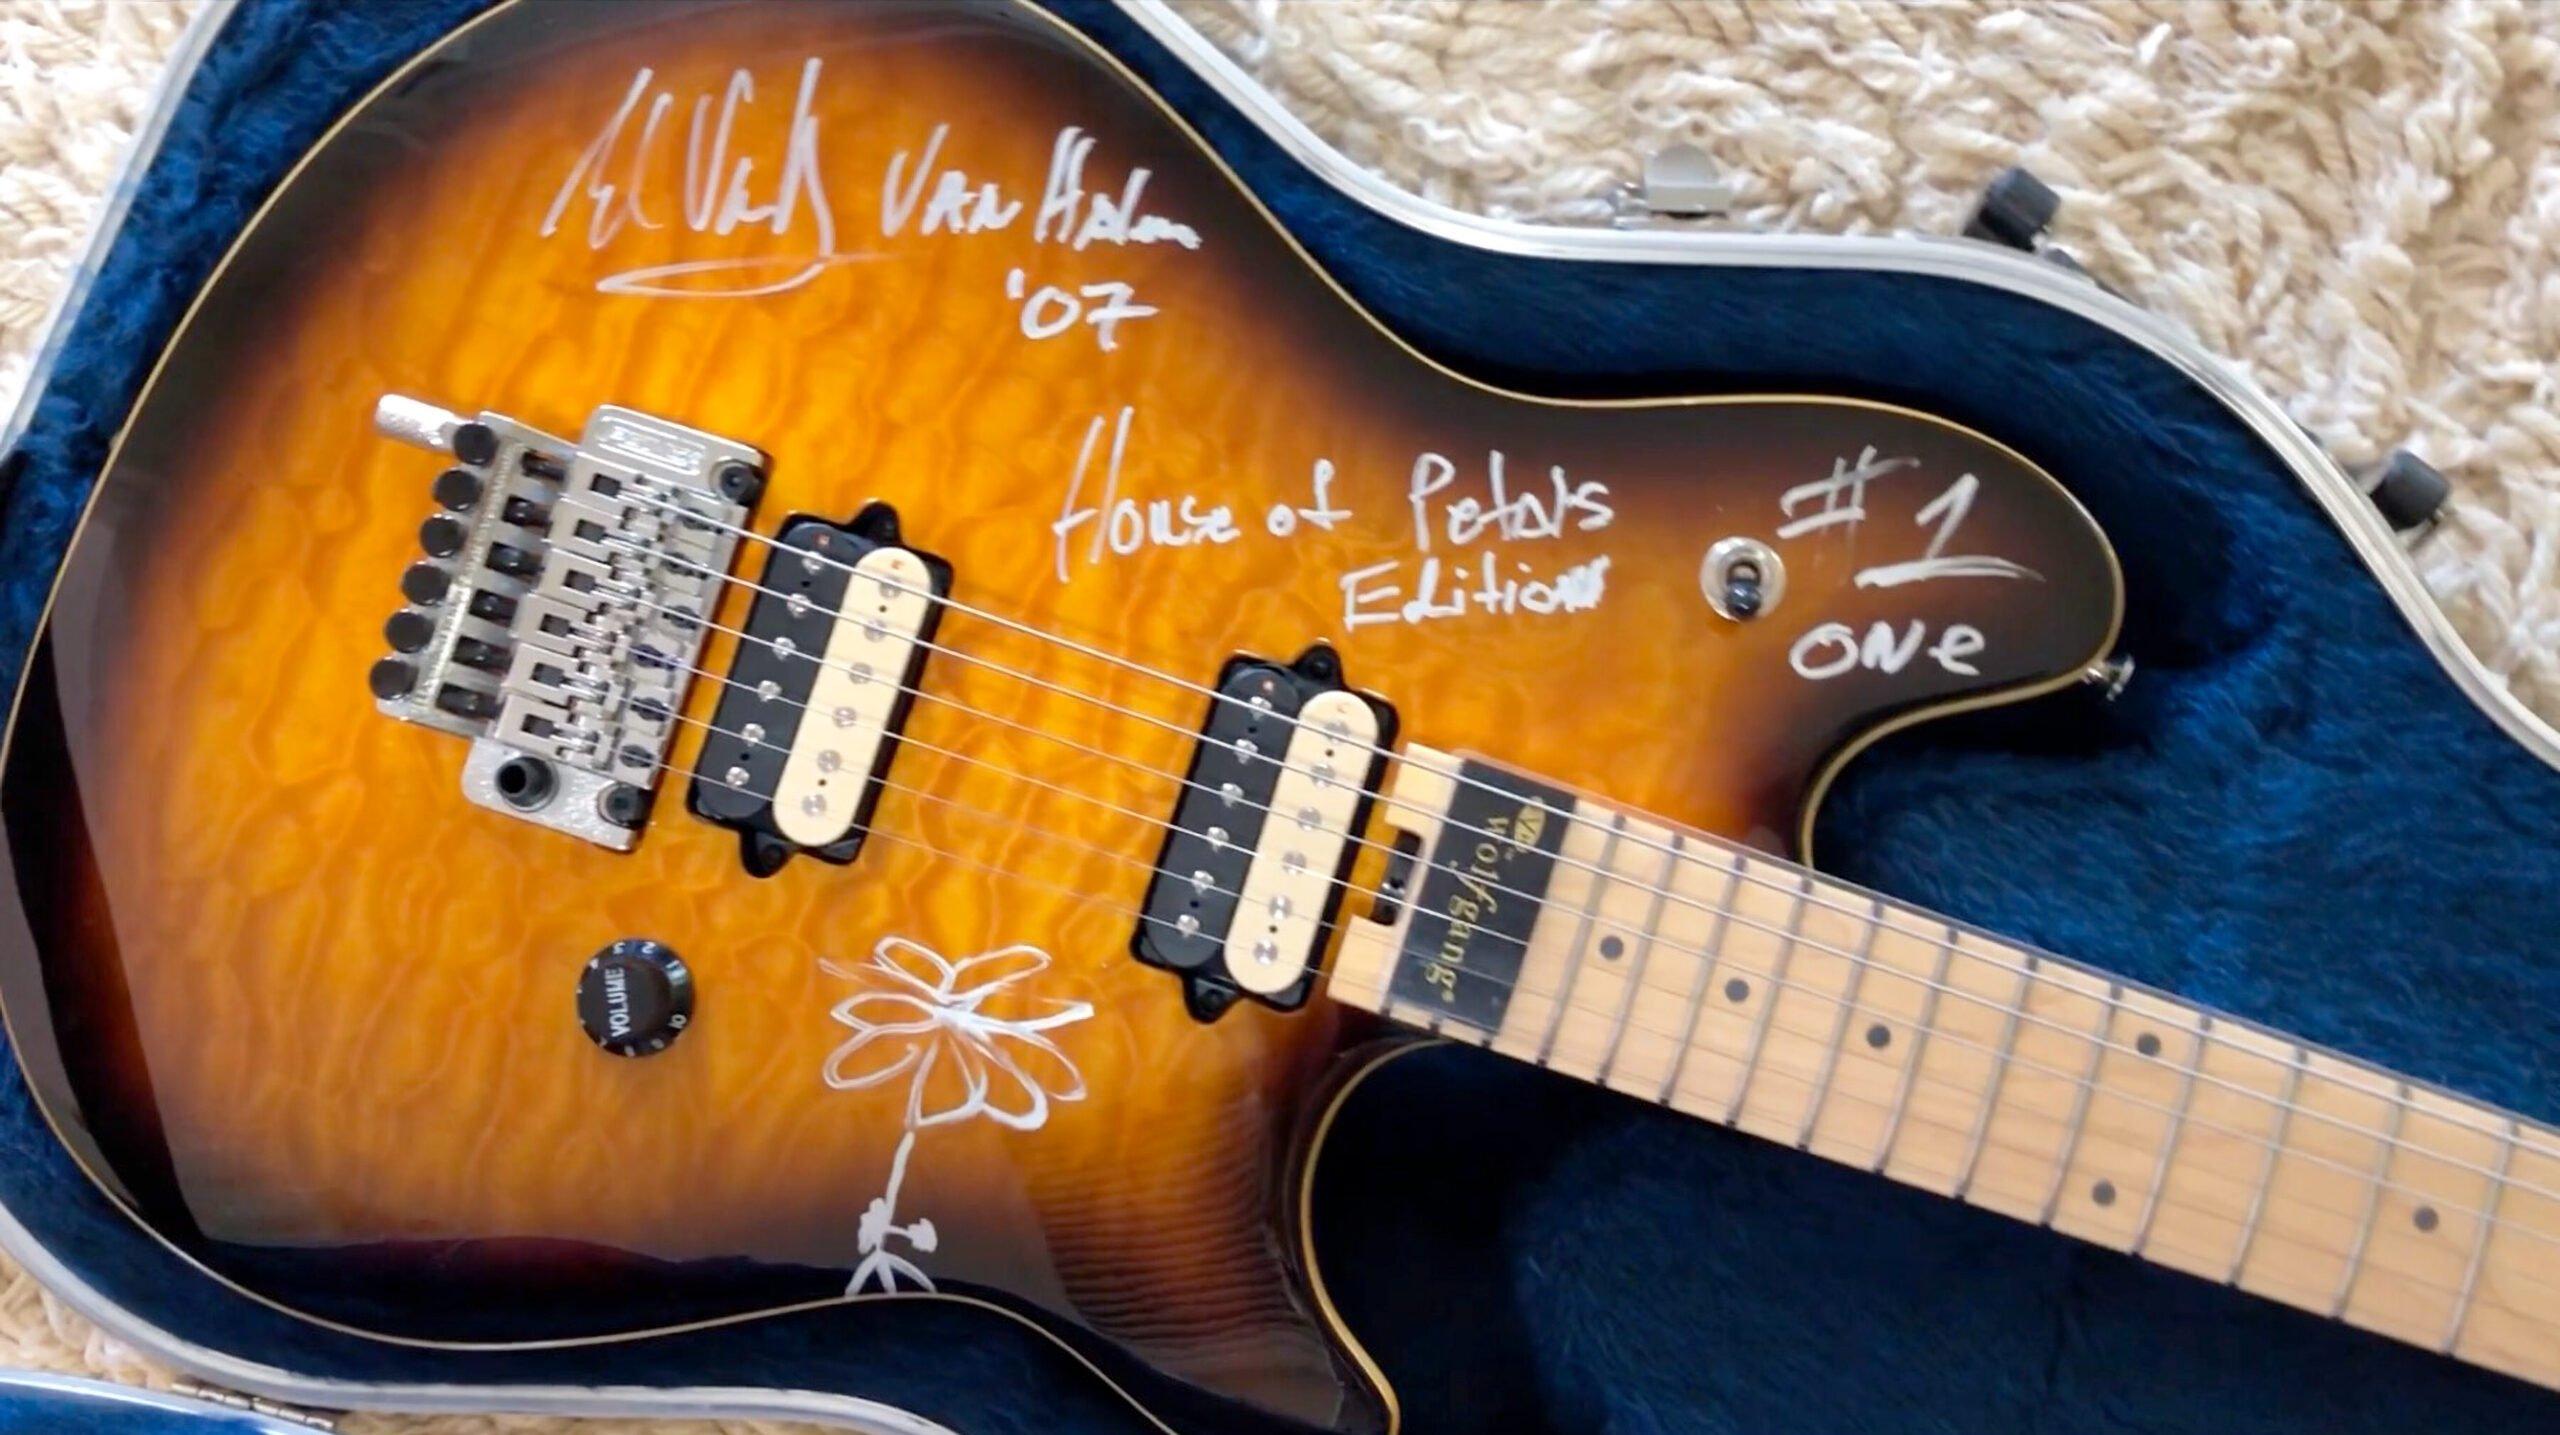 One of Eddie Van Halen's Guitars is Being Auctioned Online by Former Fiancée at EddieVanHalenGuitars.com March 25-31